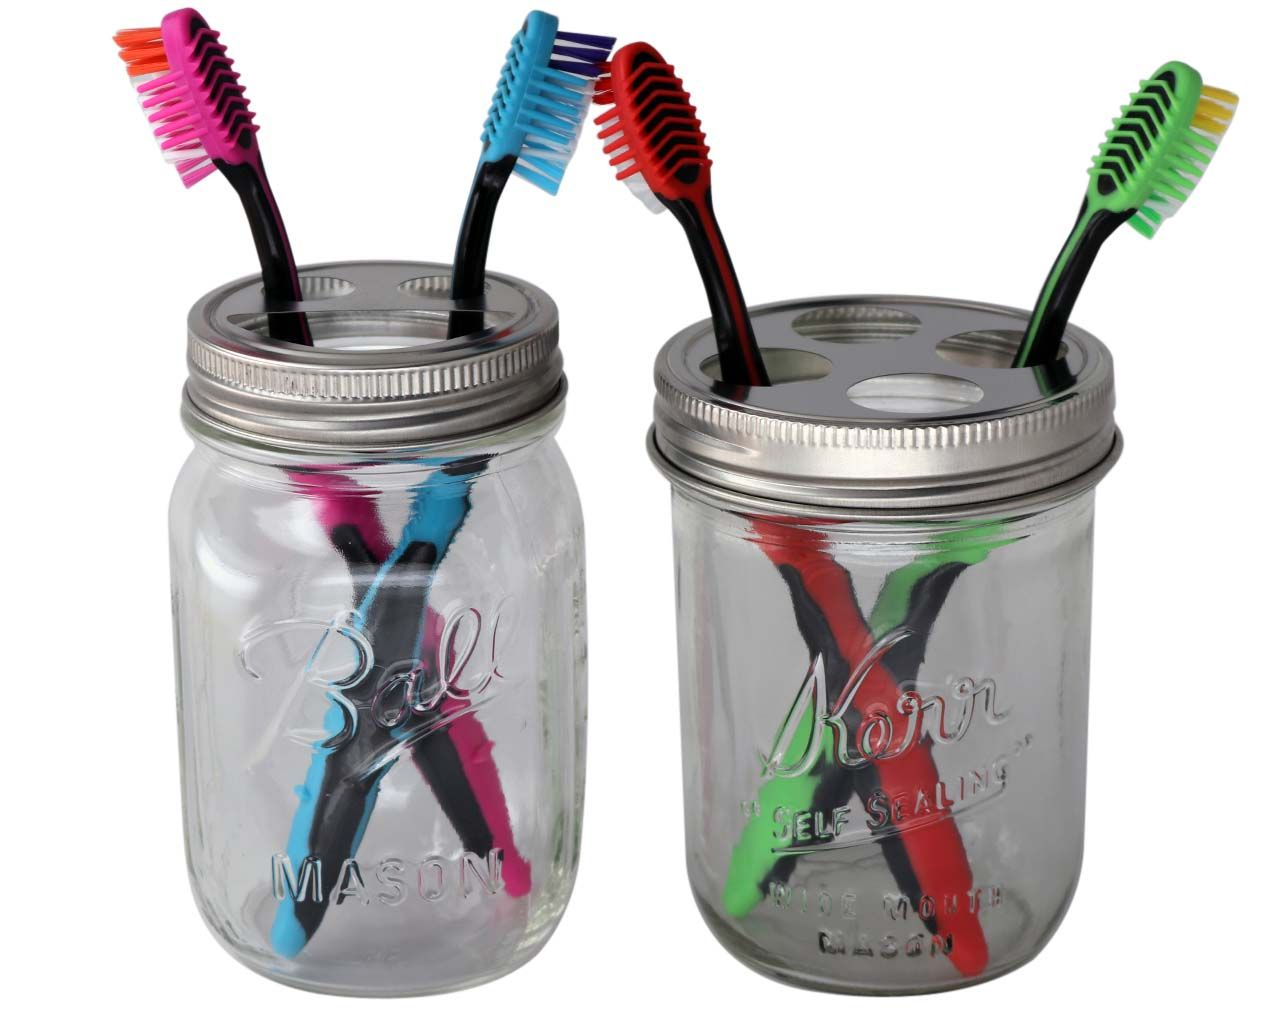 Stainless Steel Toothbrush Holder For Mason Jars Soap Pump